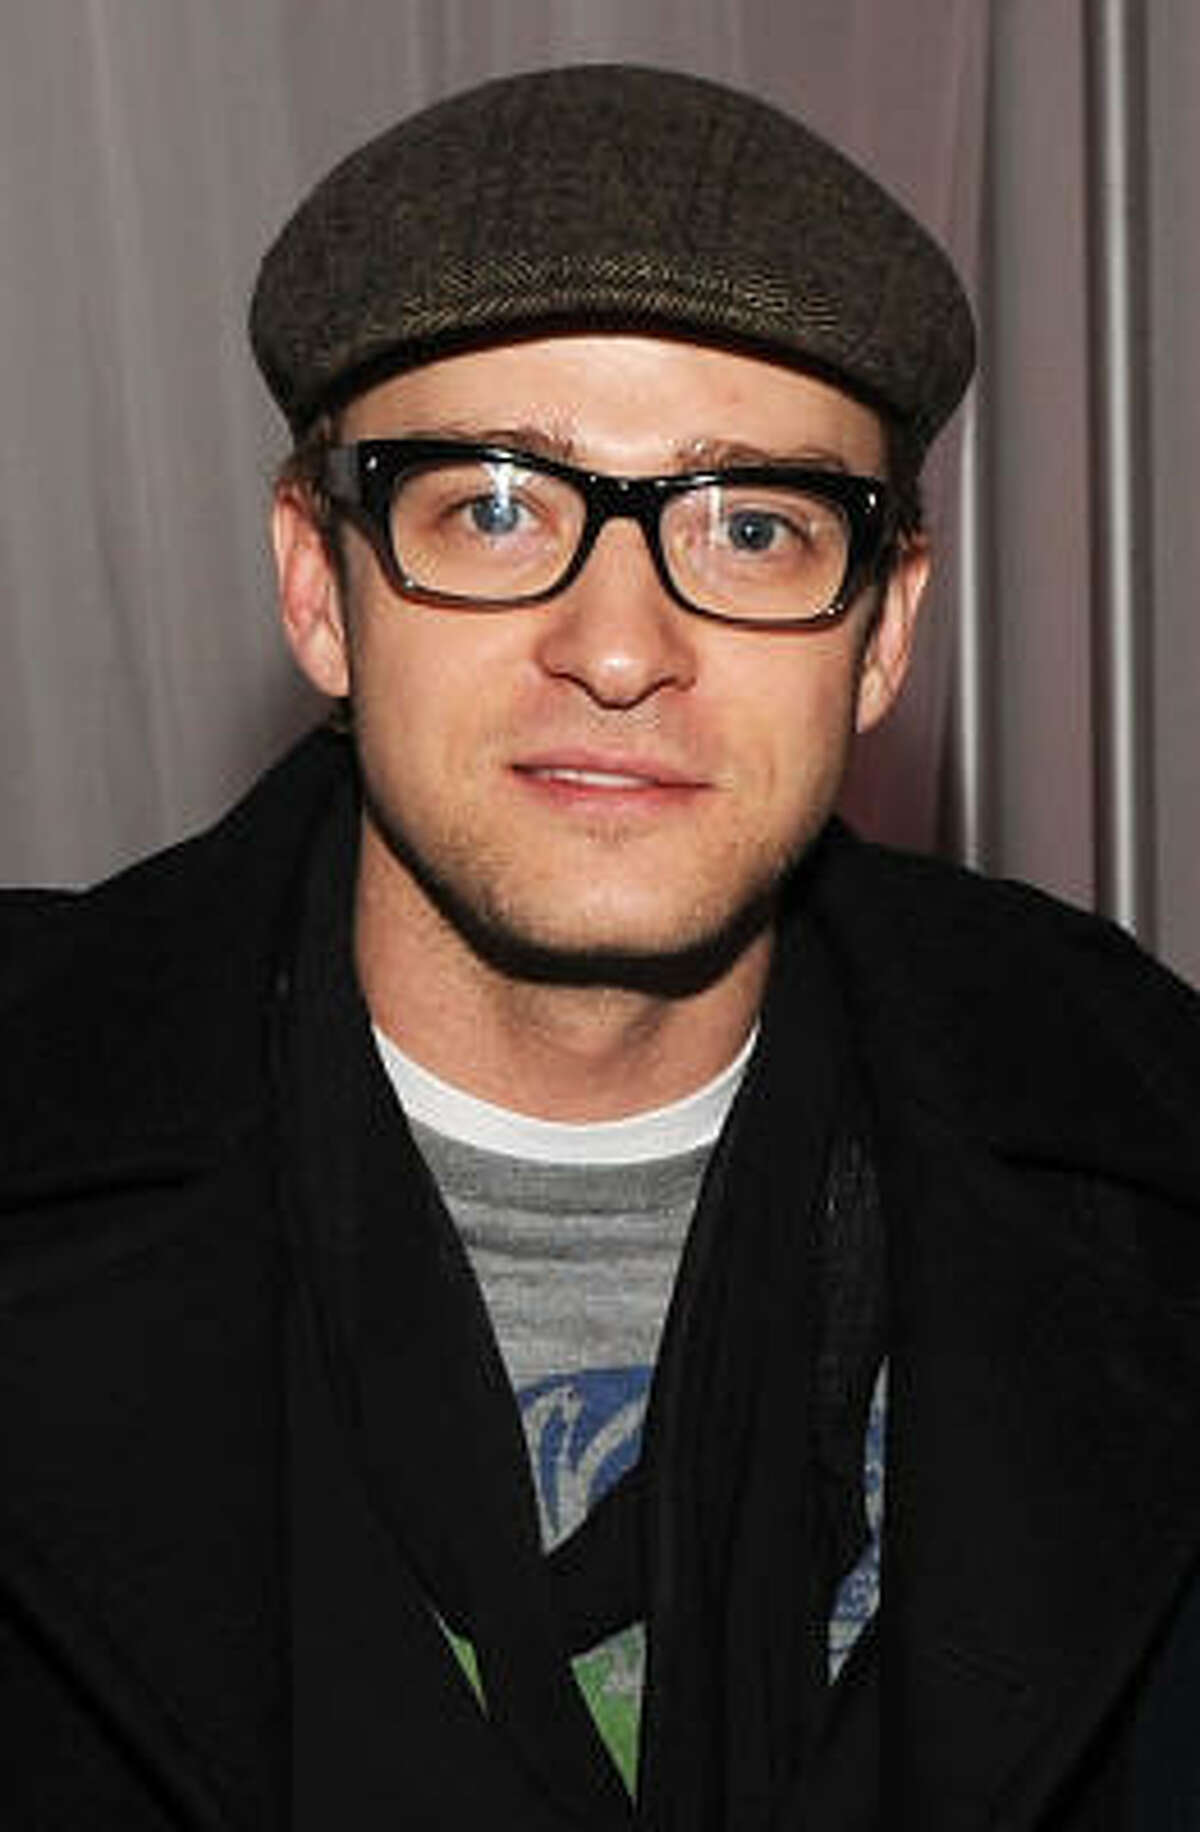 Justin Timberlake He's bringing nerdy back.